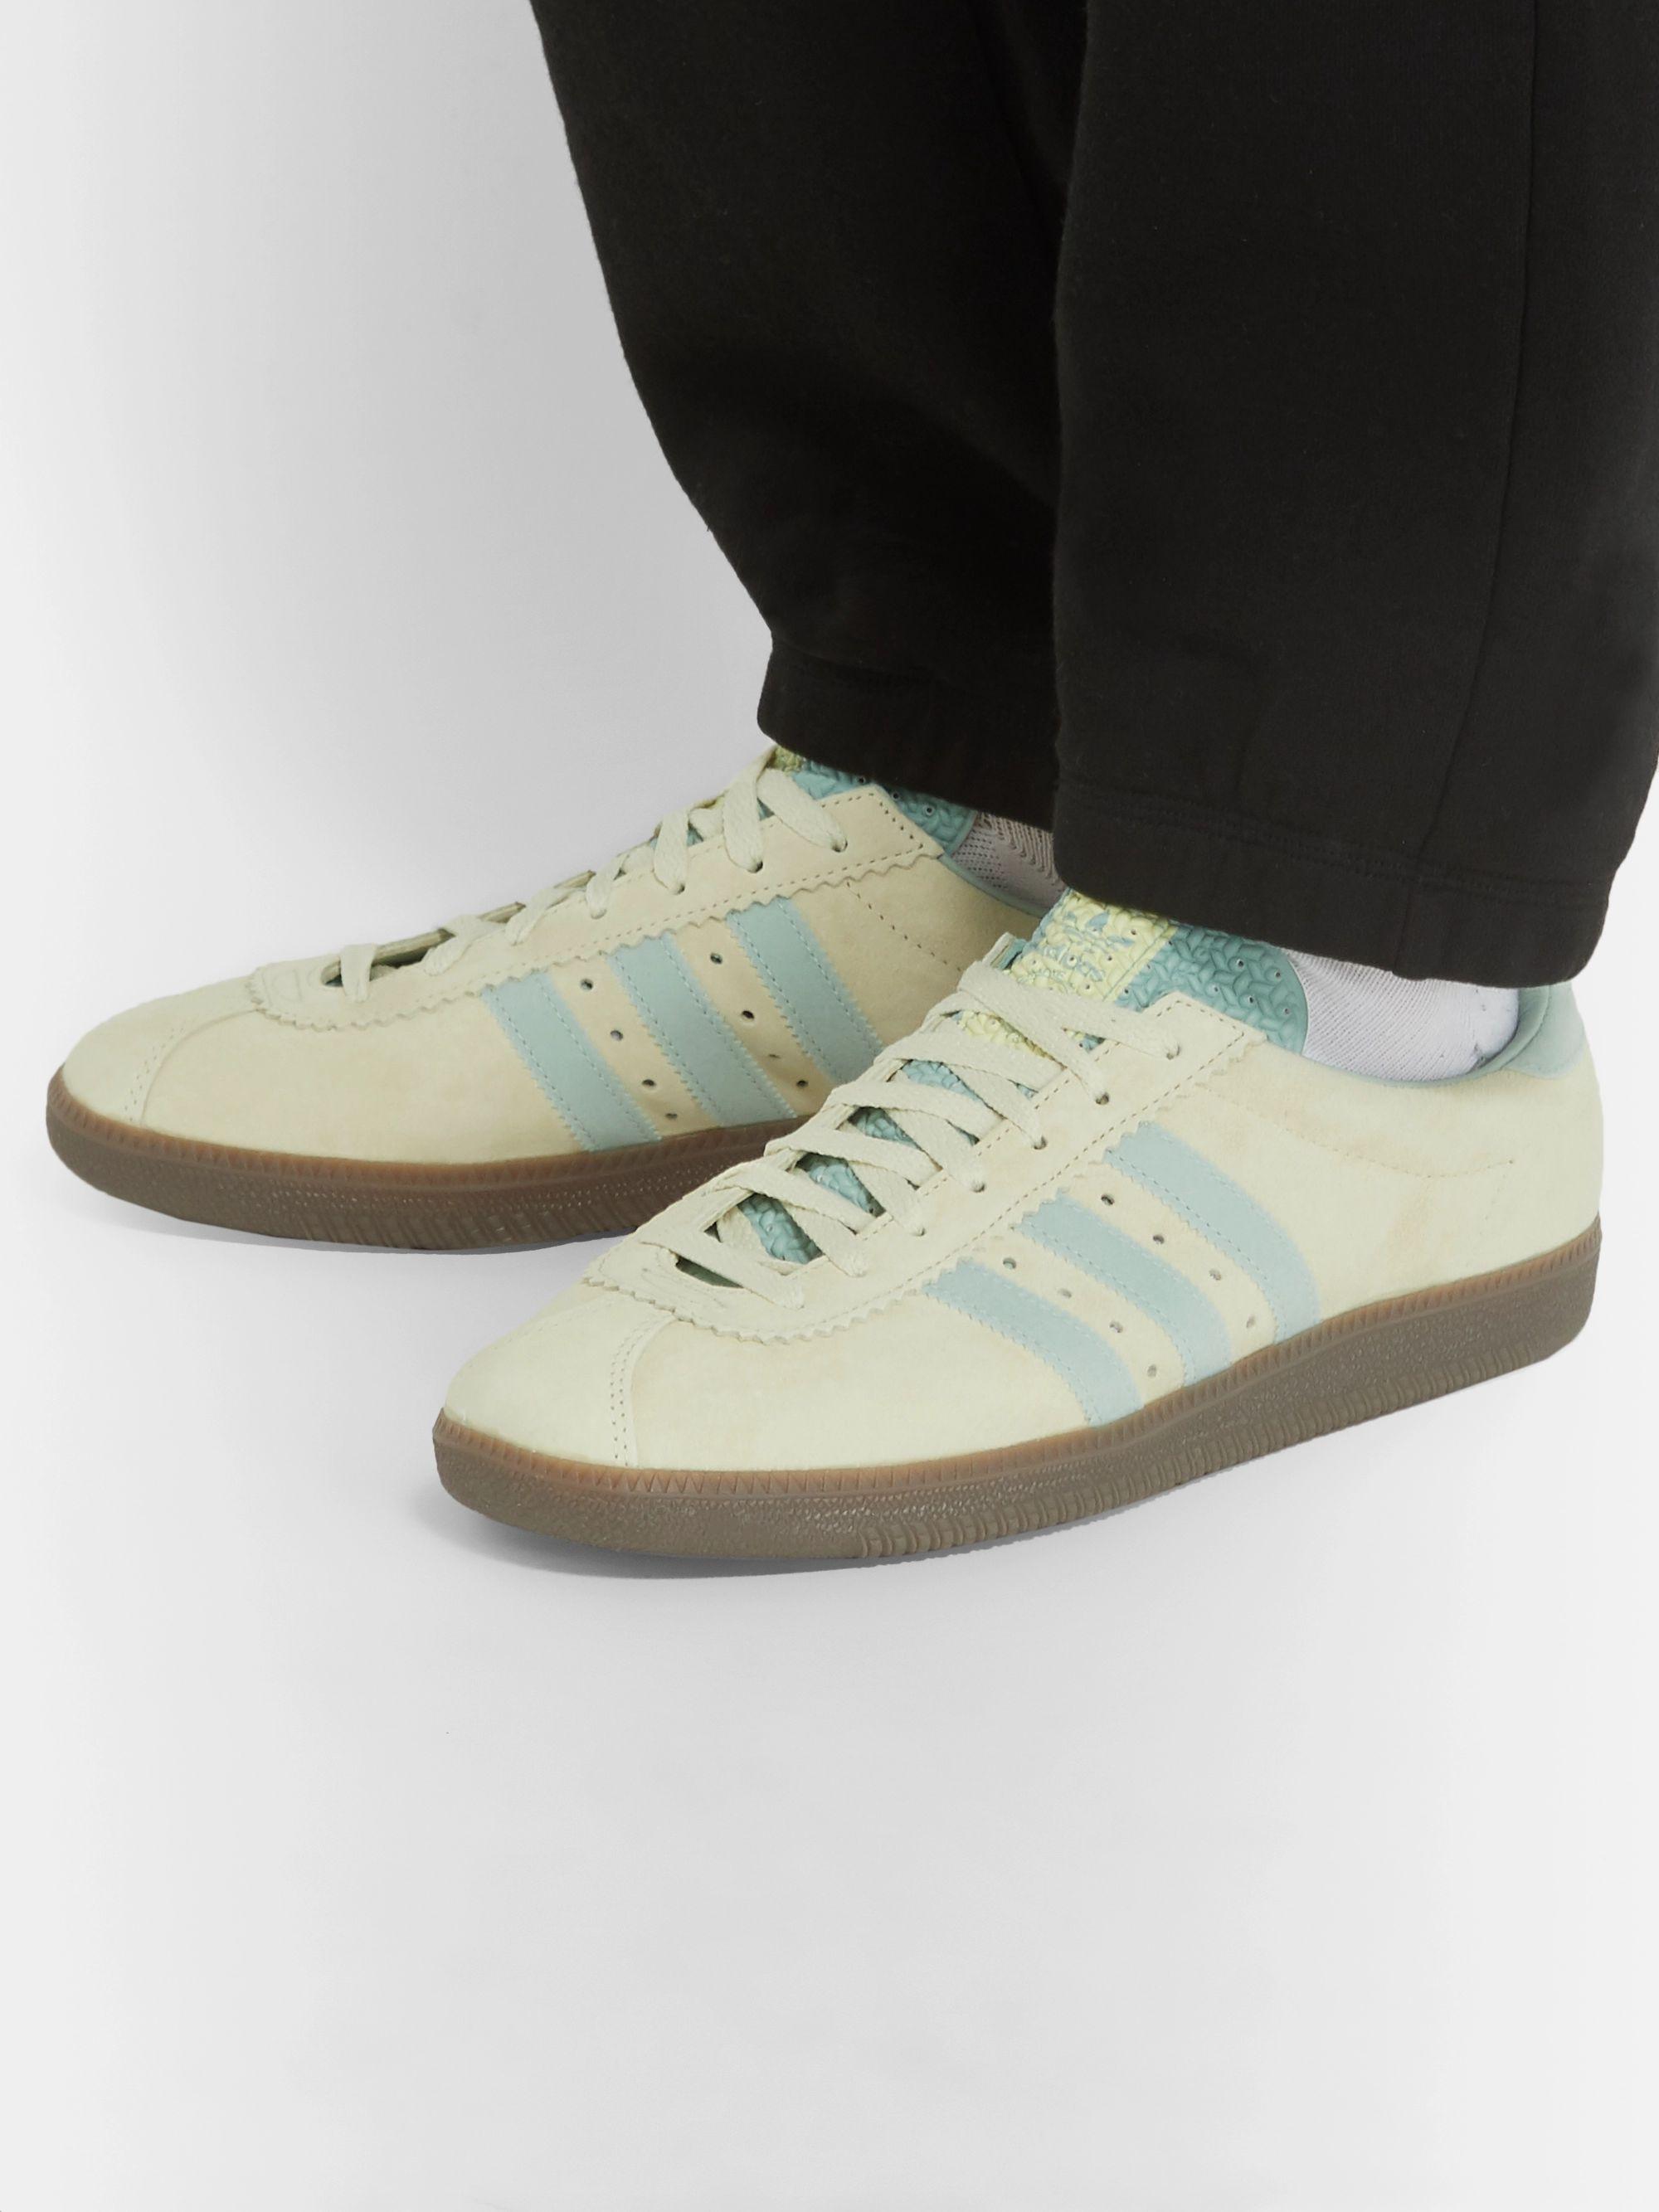 suficiente Misterio Sonrisa  Neutral Padiham Leather-Trimmed Suede Sneakers   adidas Originals ...